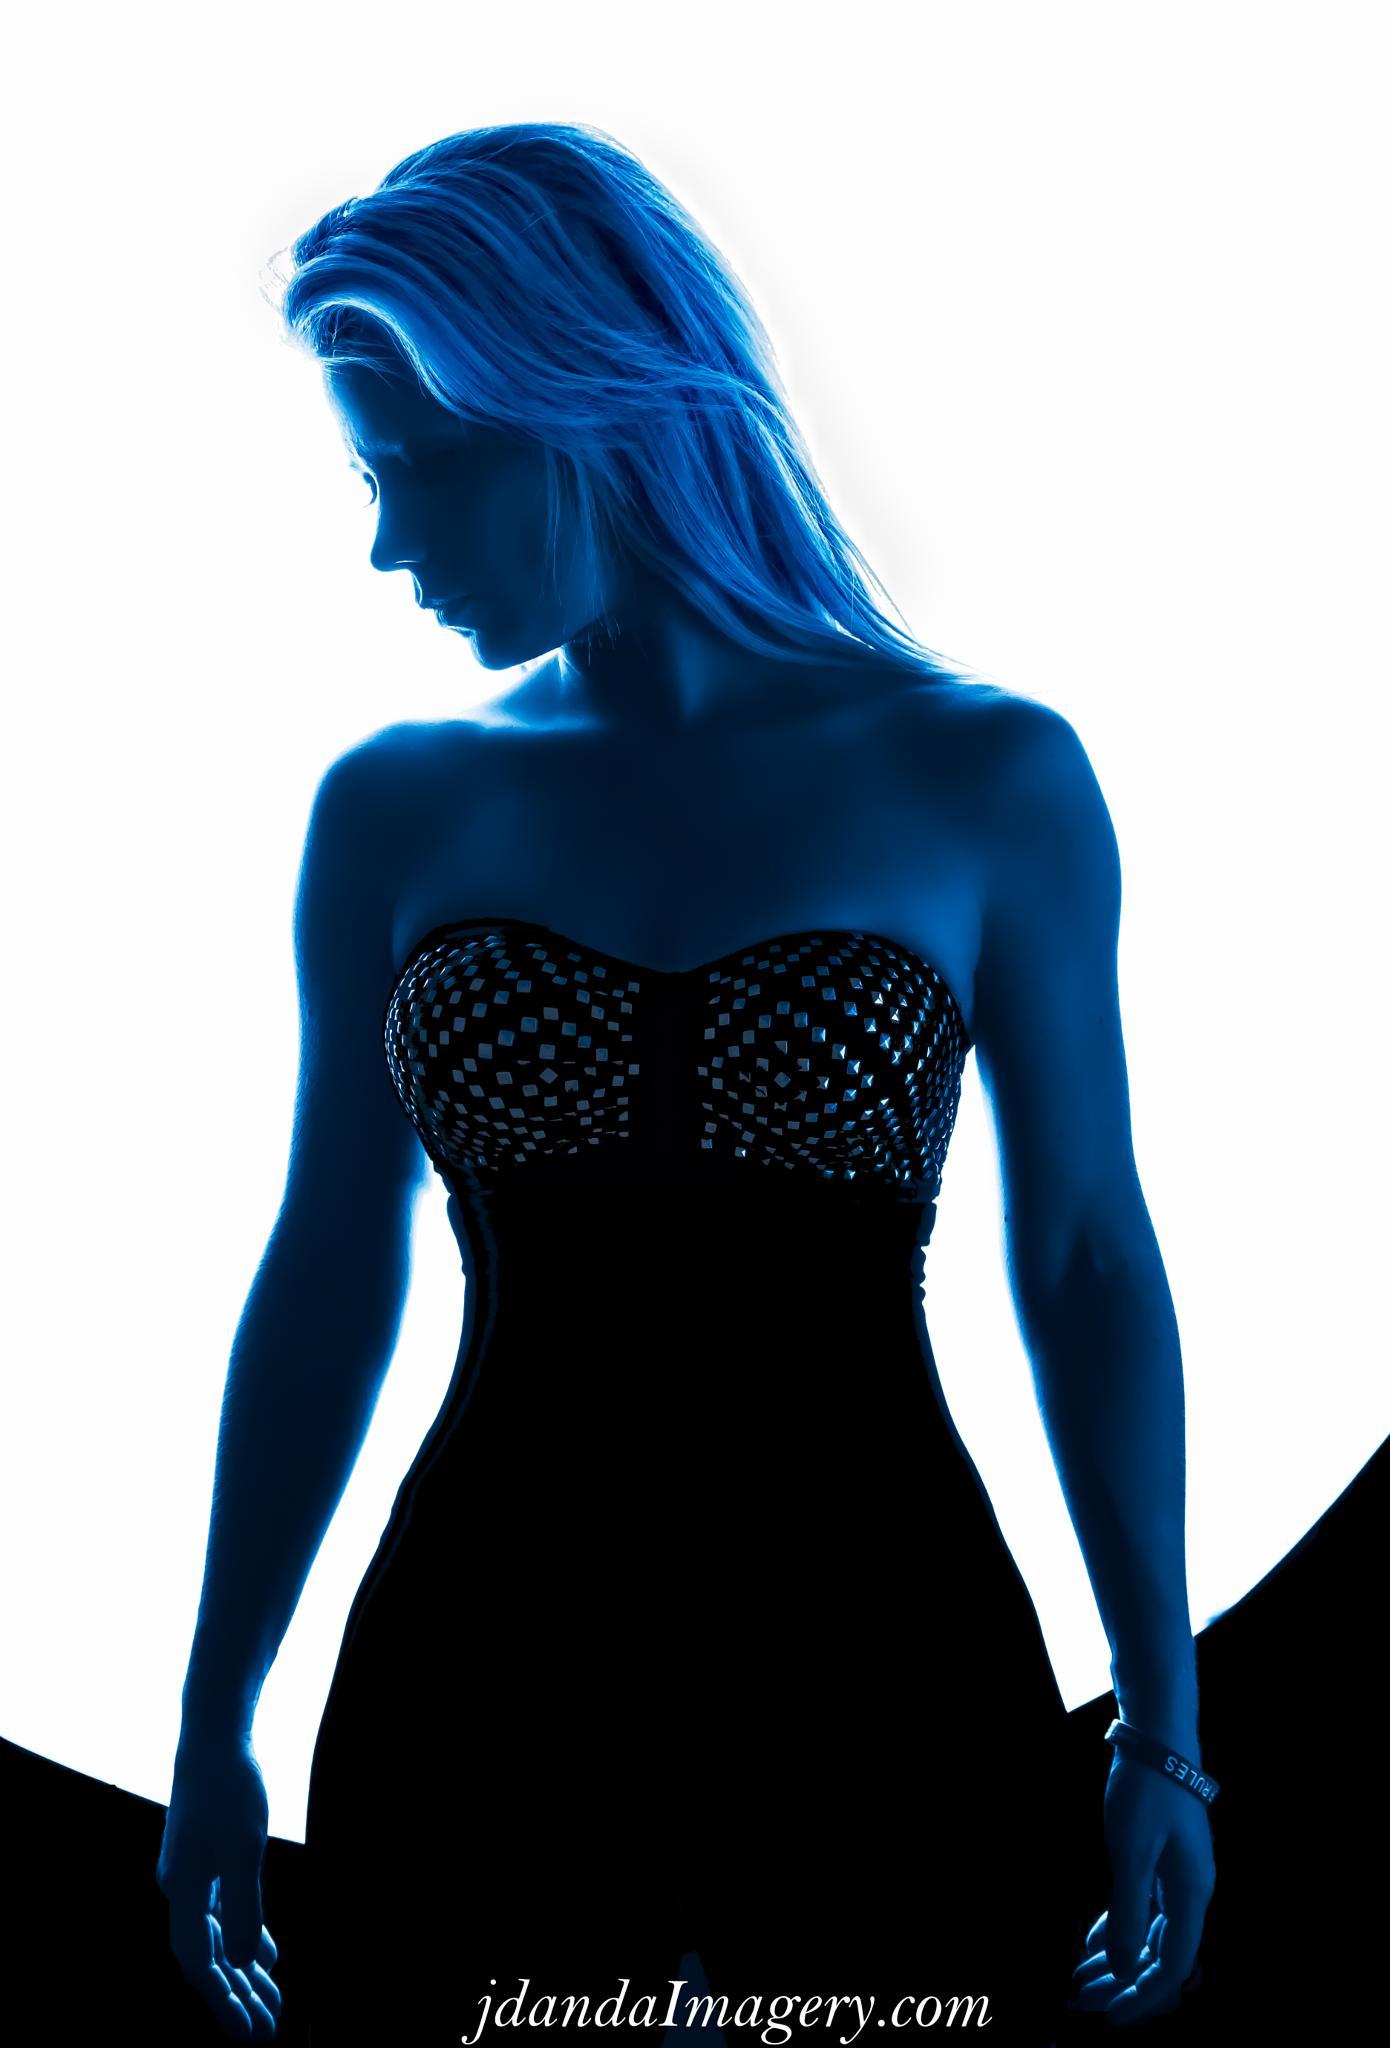 Blue Lady by jdandaImagery